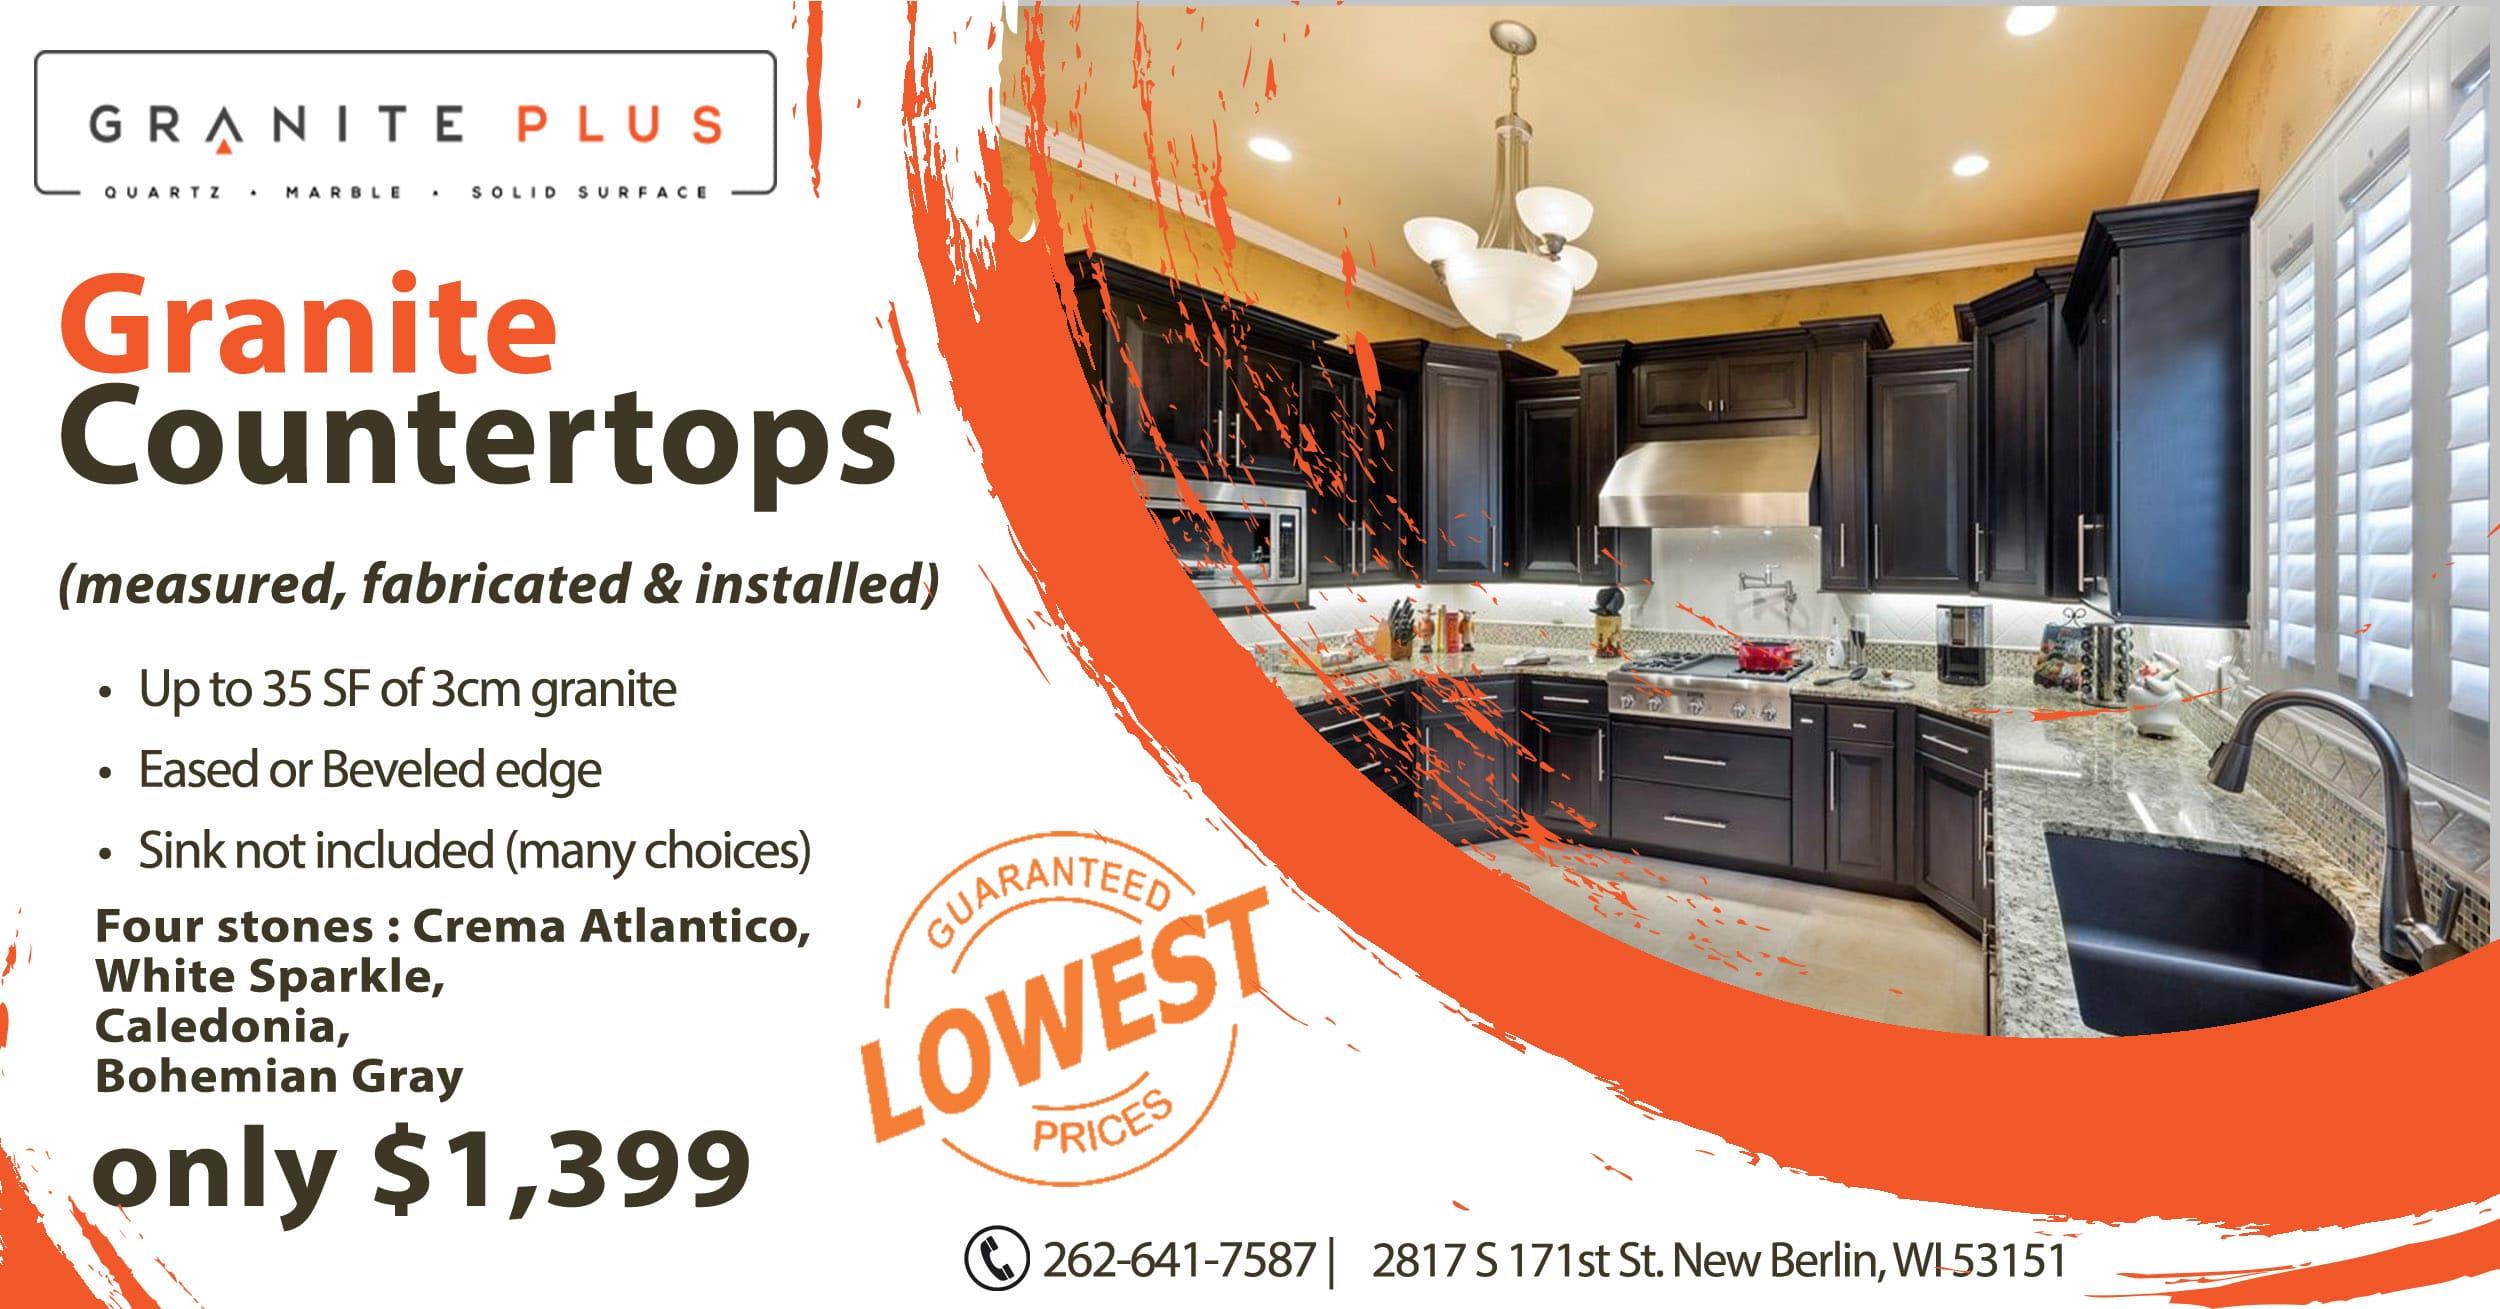 Granite Plus Granite Countertops 1399 - Countertop Sales & Discounts Milwaukee Wisconsin